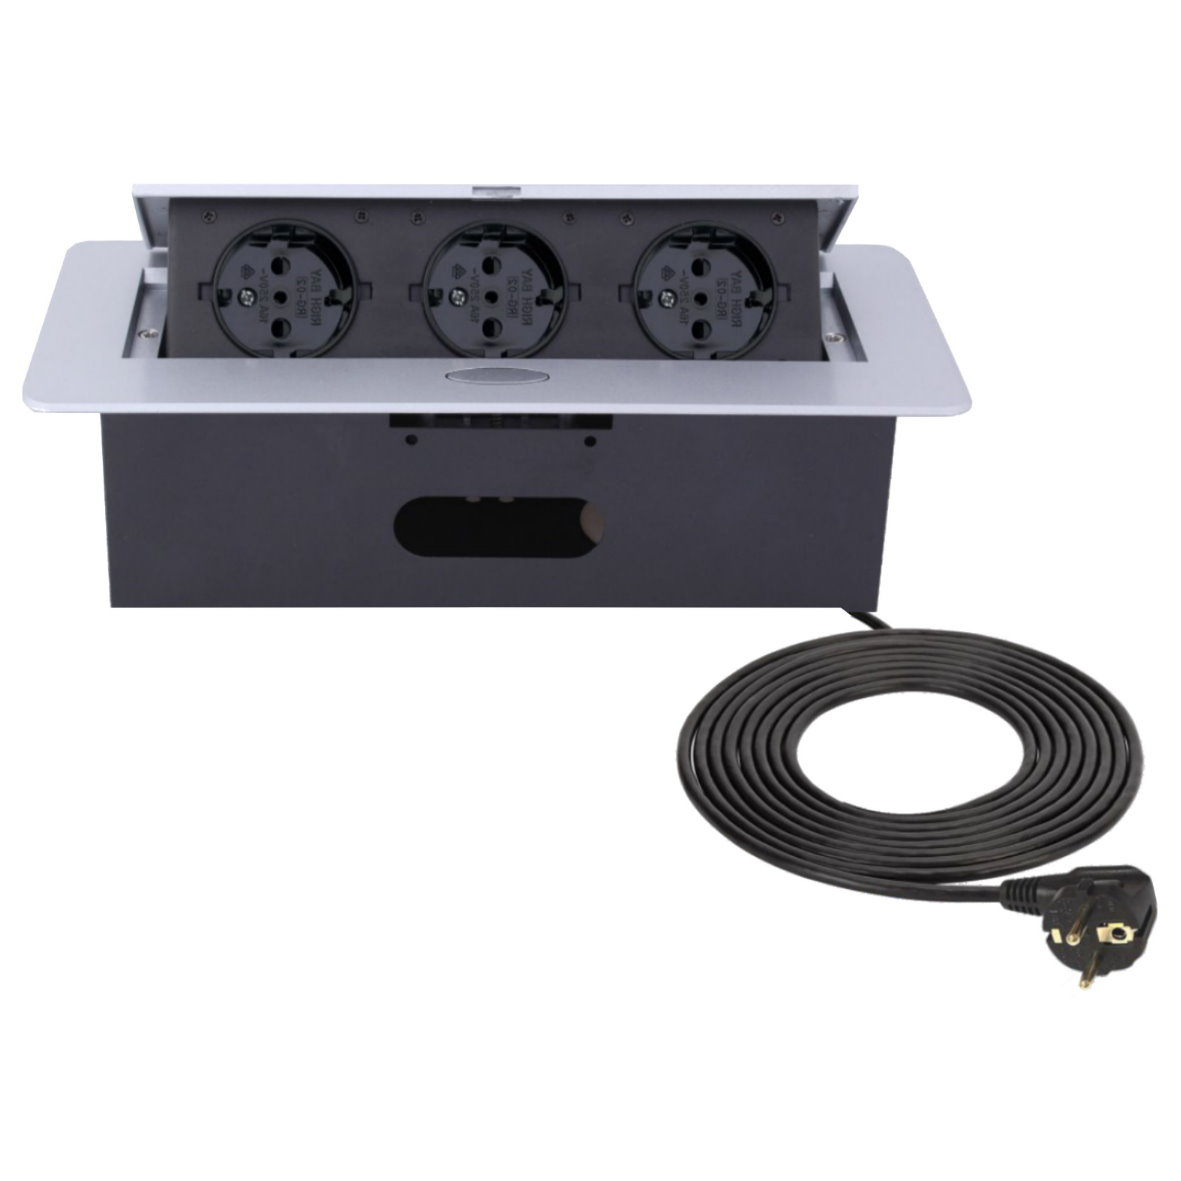 einbausteckdose 3-fach kabel 3m - tischsteckdose bodensteckdose